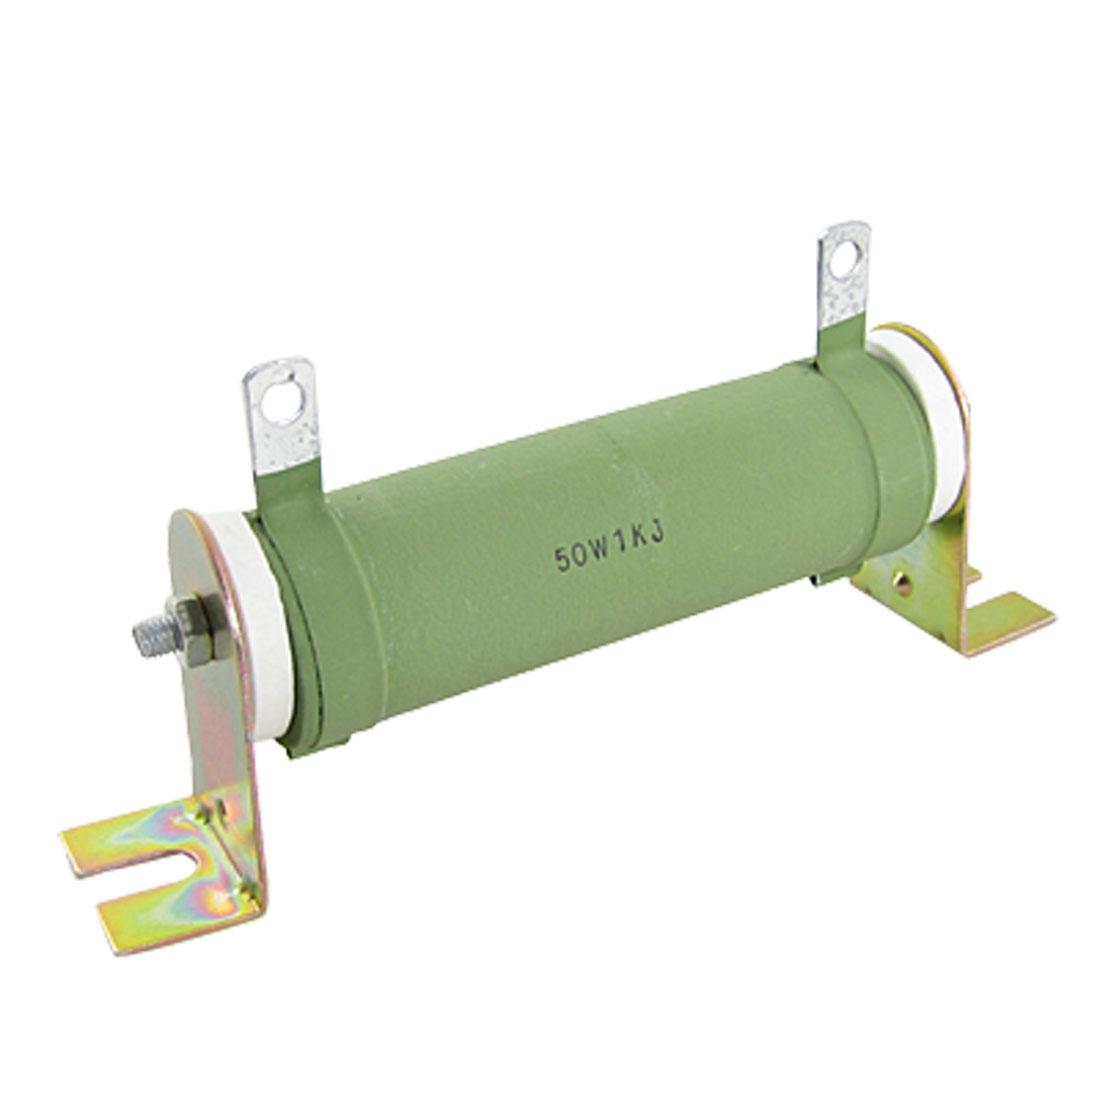 1K ohm 5 Watts High Power Ceramic Tube Resistor 50W